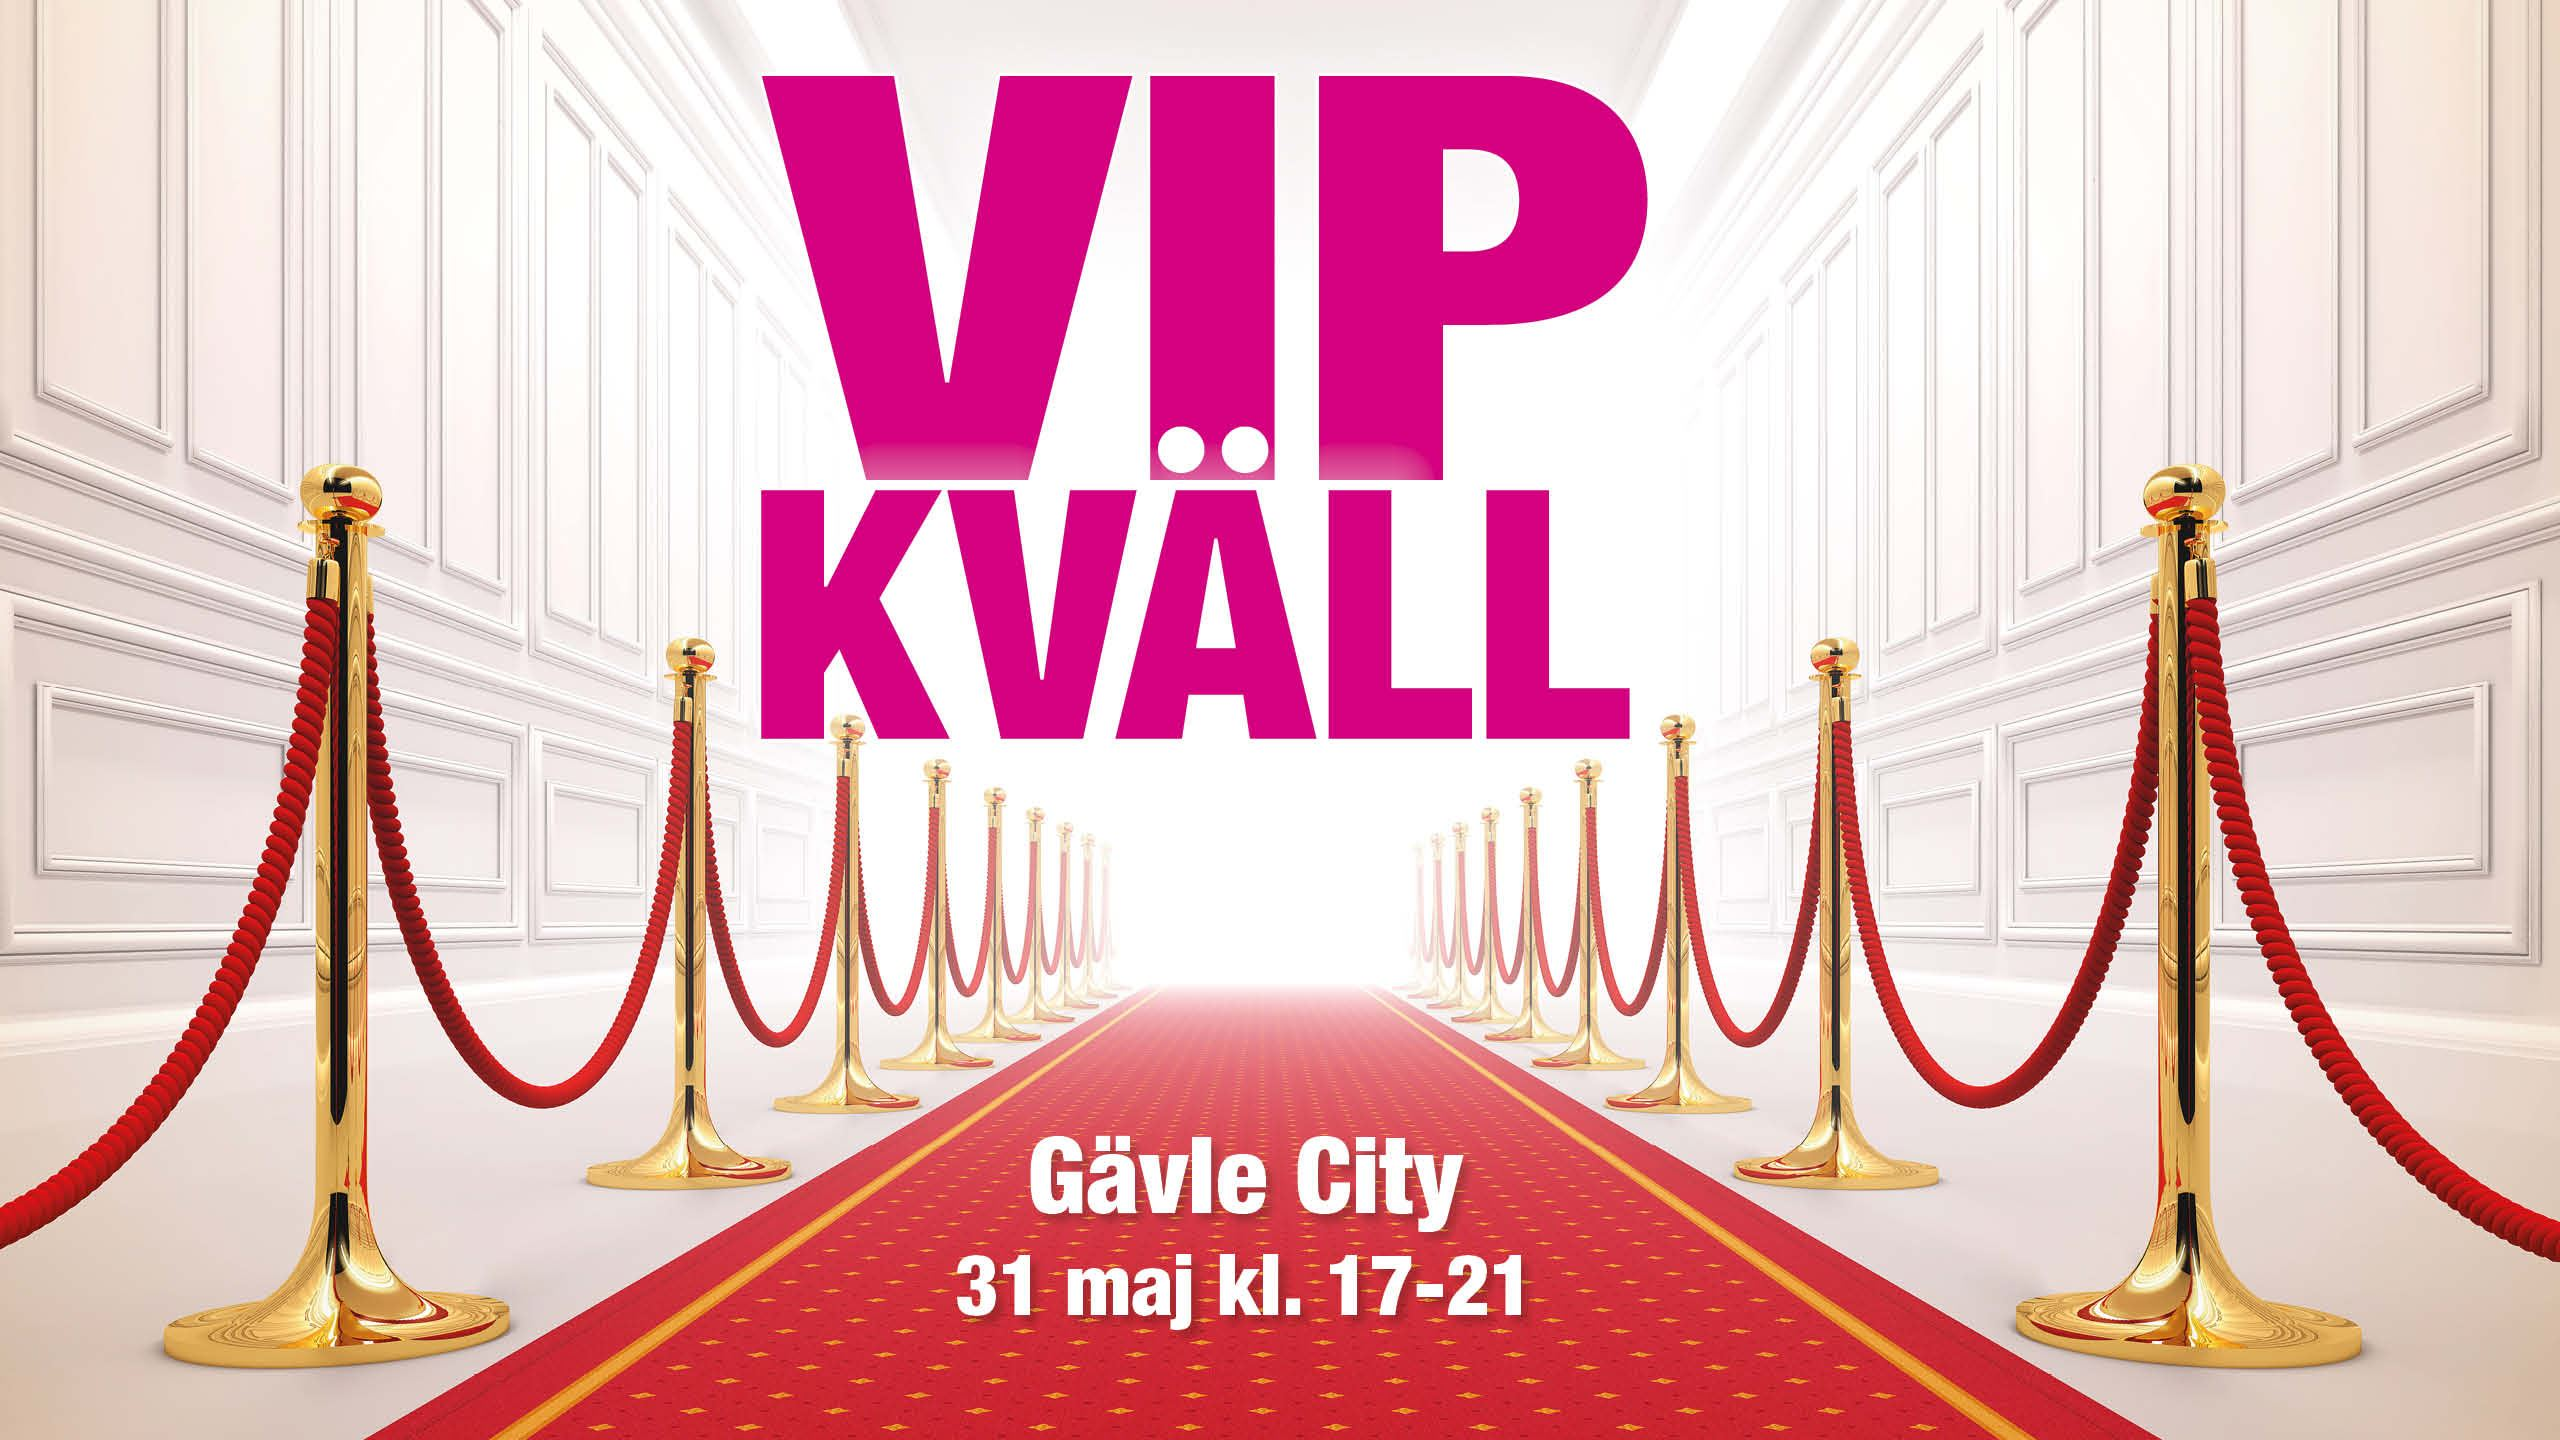 VIP kväll i Gävle City - 31 maj